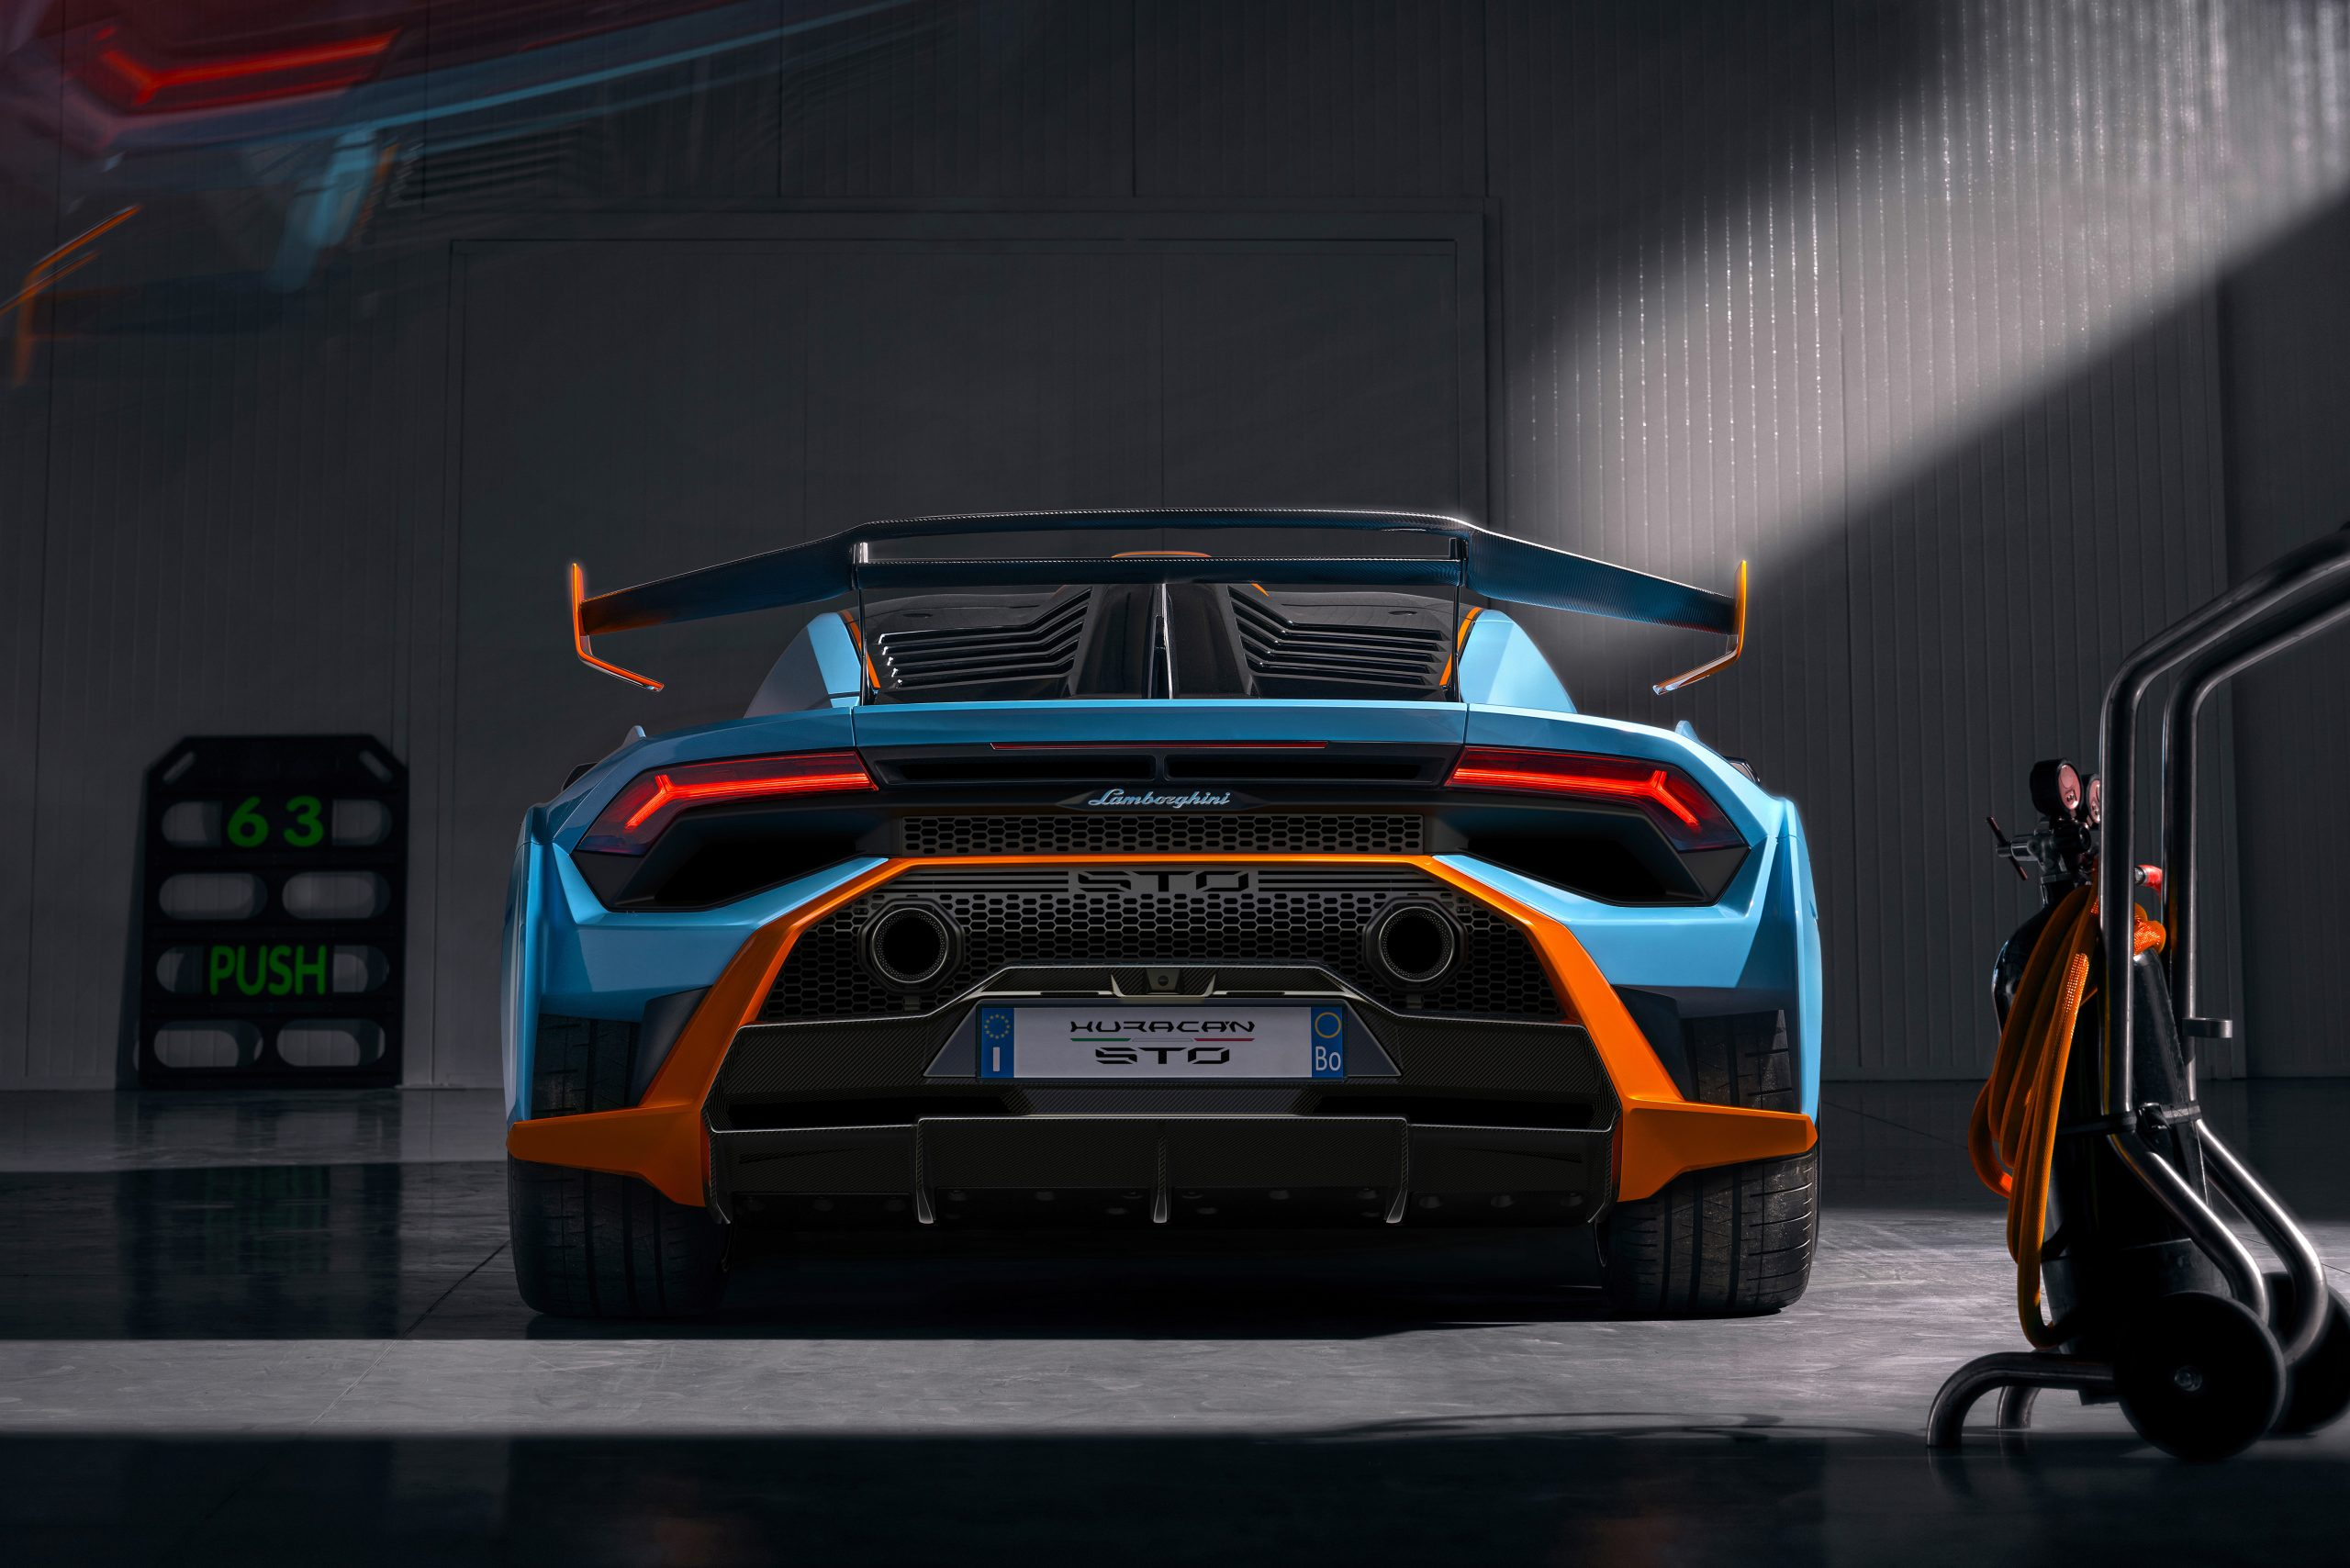 Lamborghini Huracan STO rear garage 2